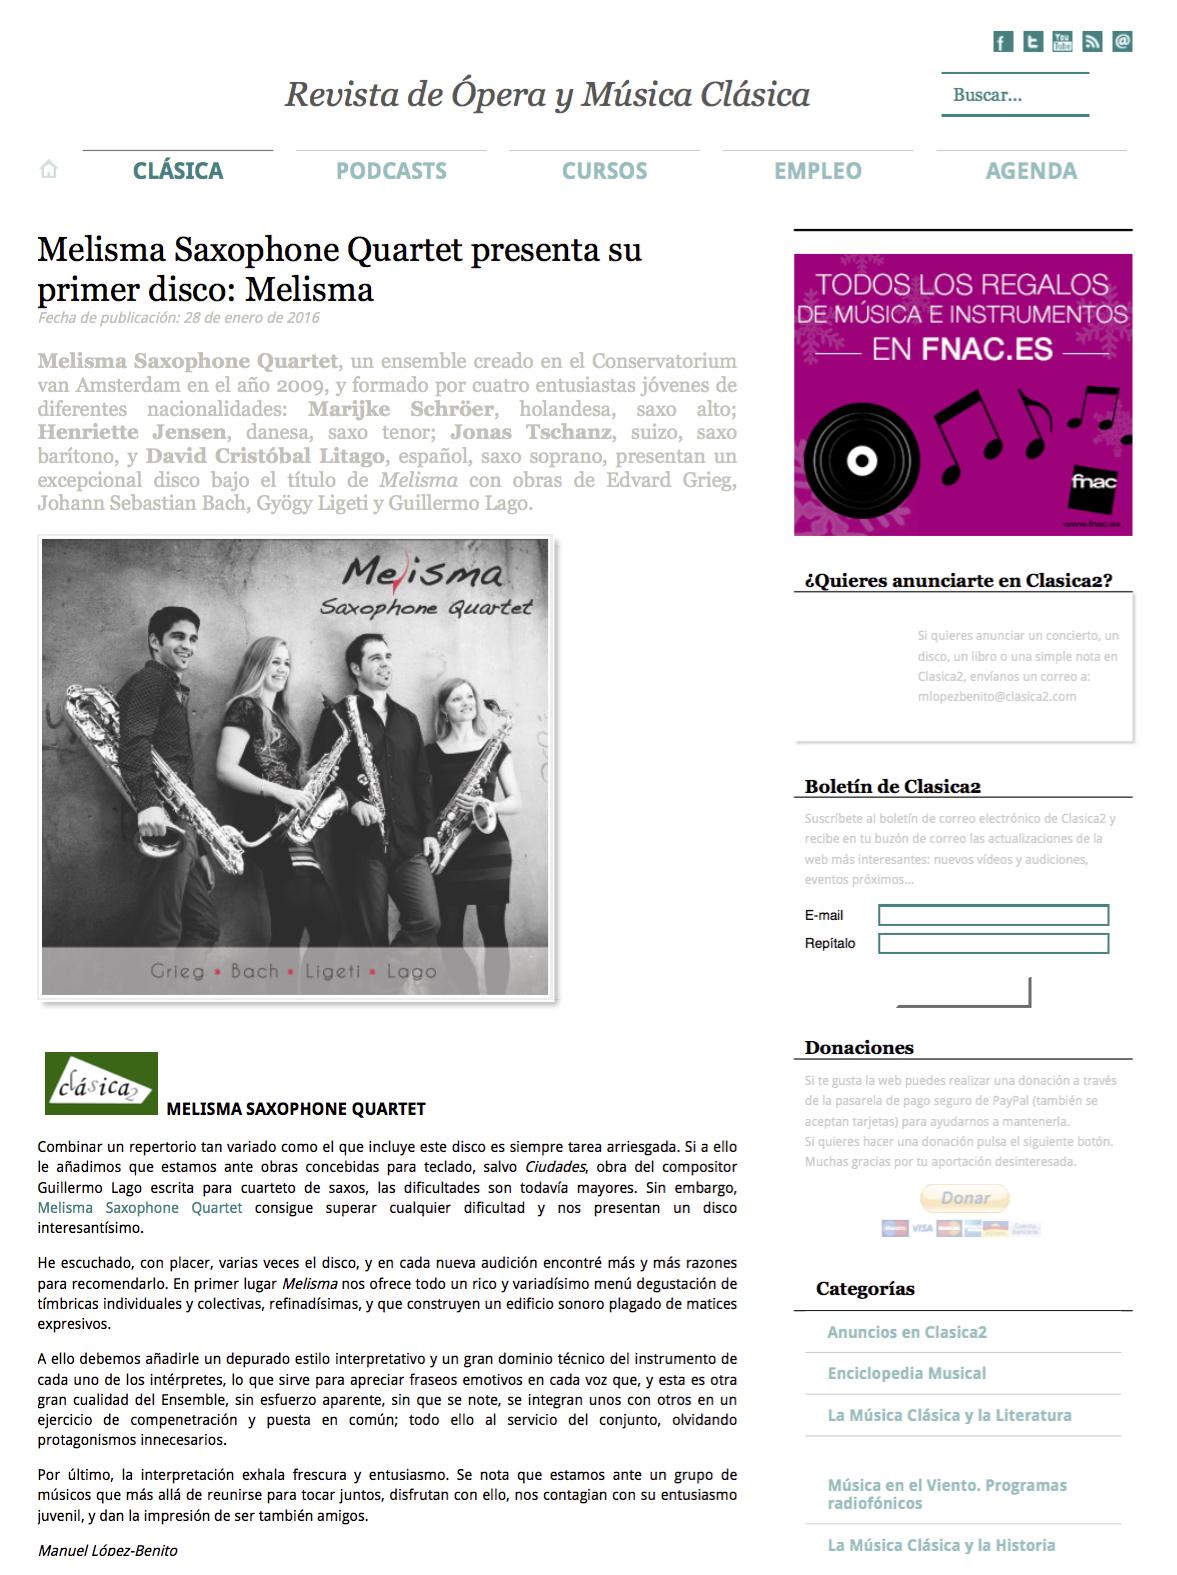 Melisma Saxophone Quartet presenta su primer disco: Melisma - Clásica2 - Revista de música clásica y ópera.